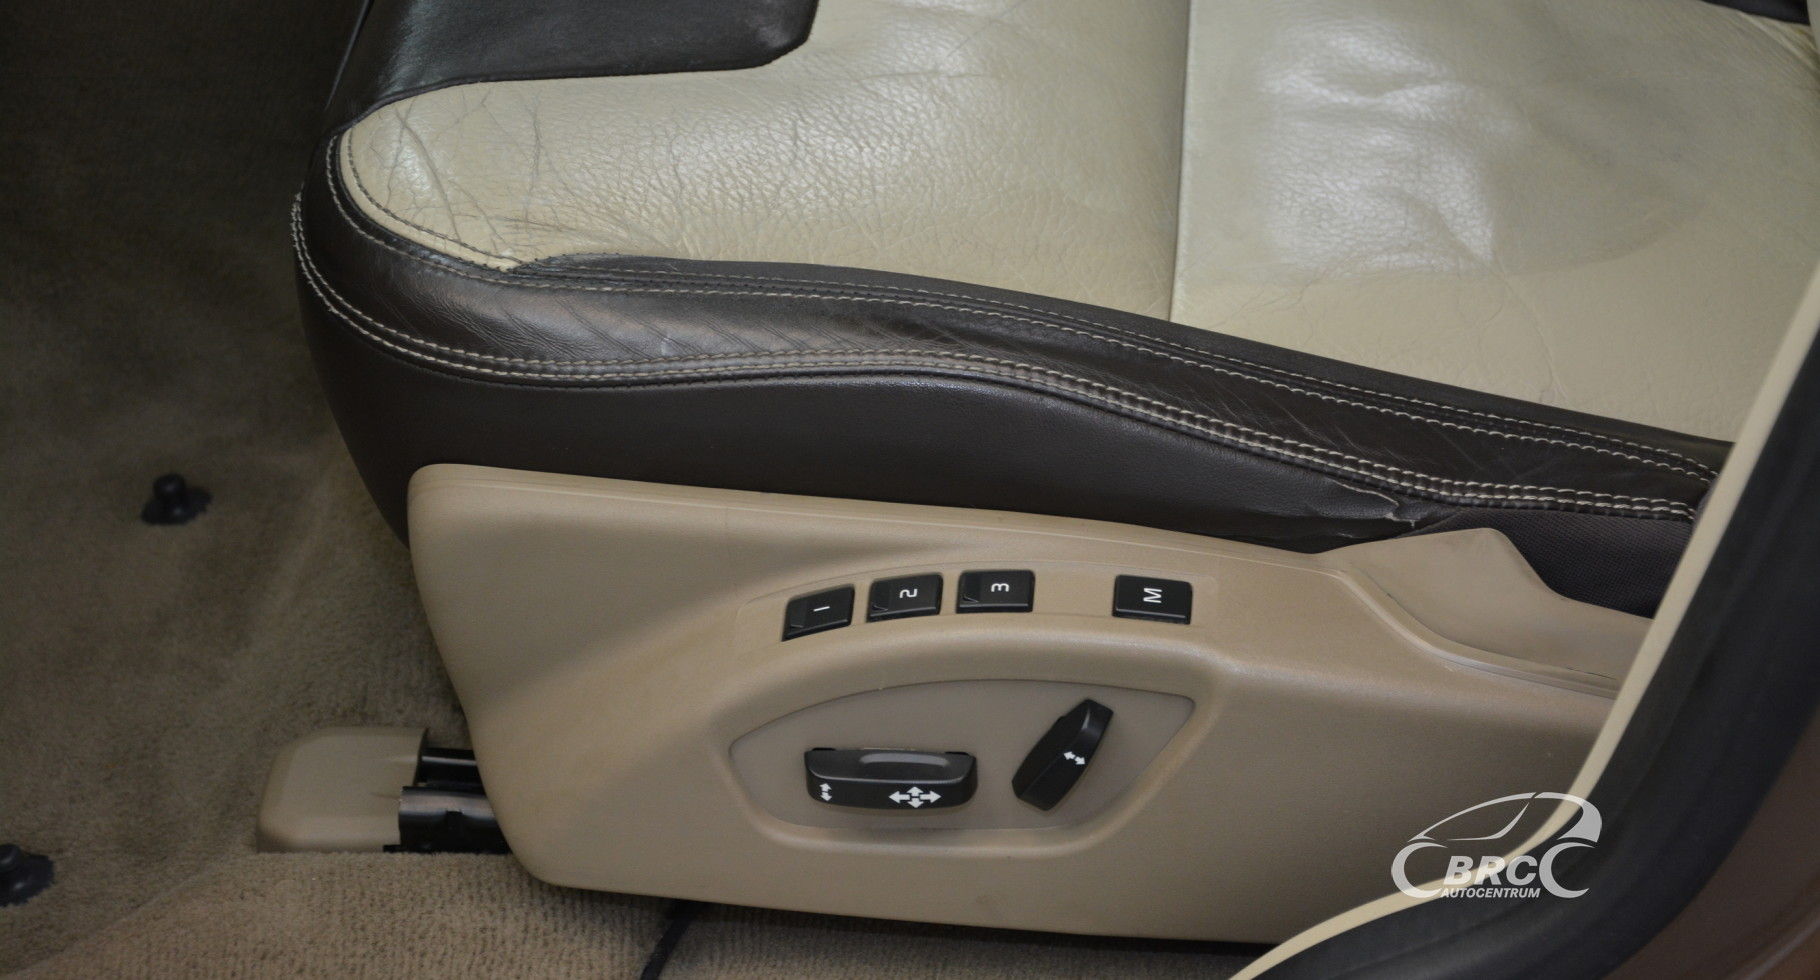 Volvo XC 60 3.2 FWD Automatas